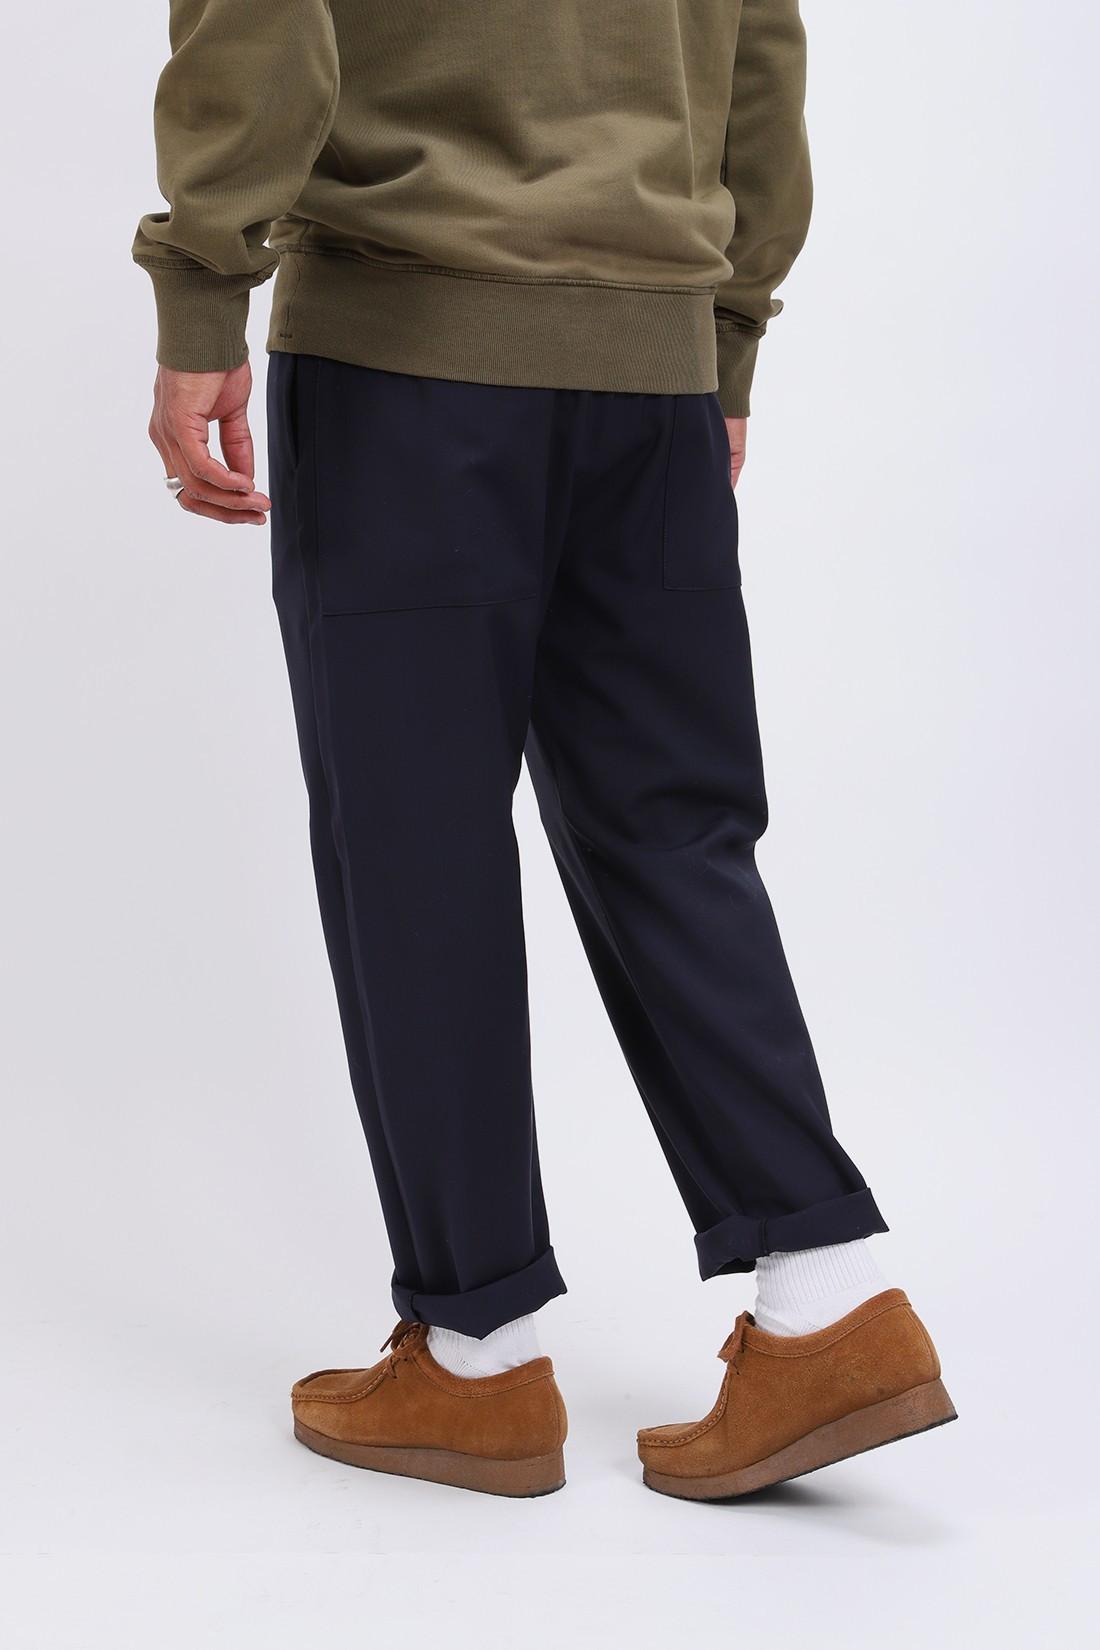 BARENA / Pantalone bativoga tela Navy